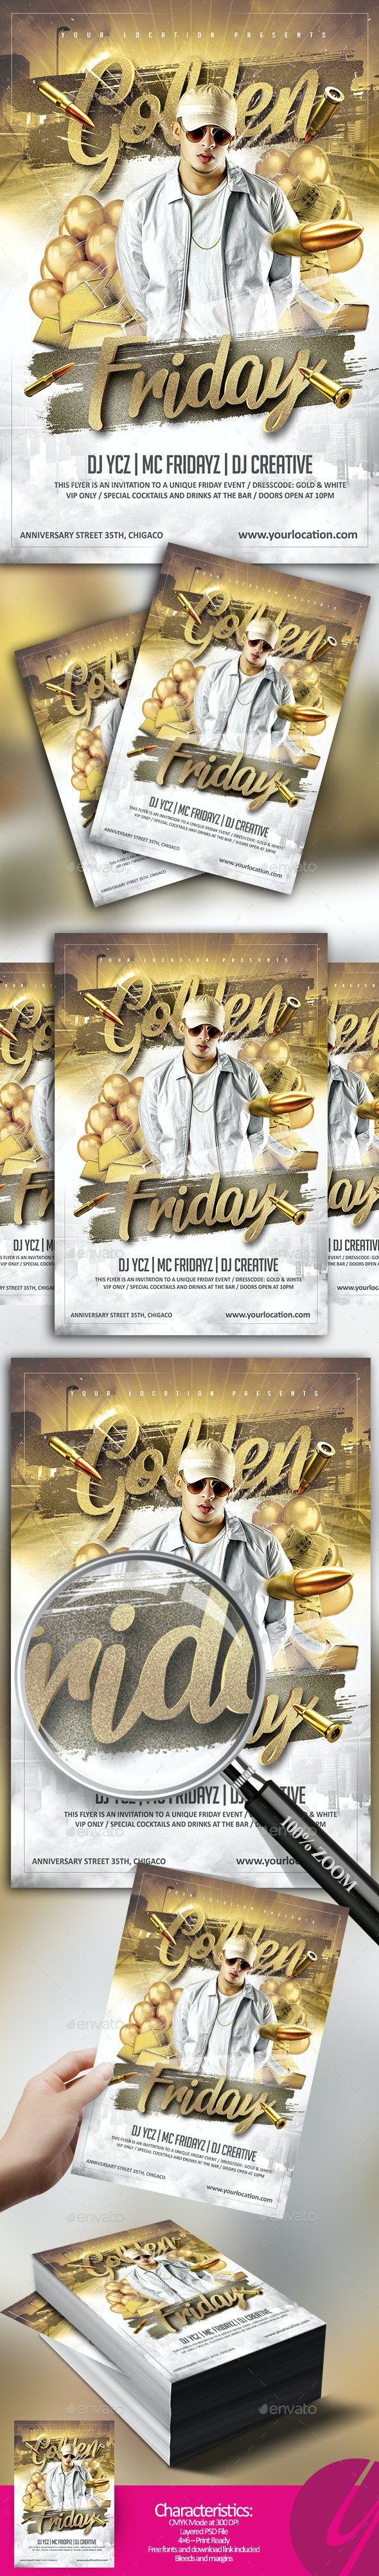 Golden Fridays Flyer - Clubs & Parties Events